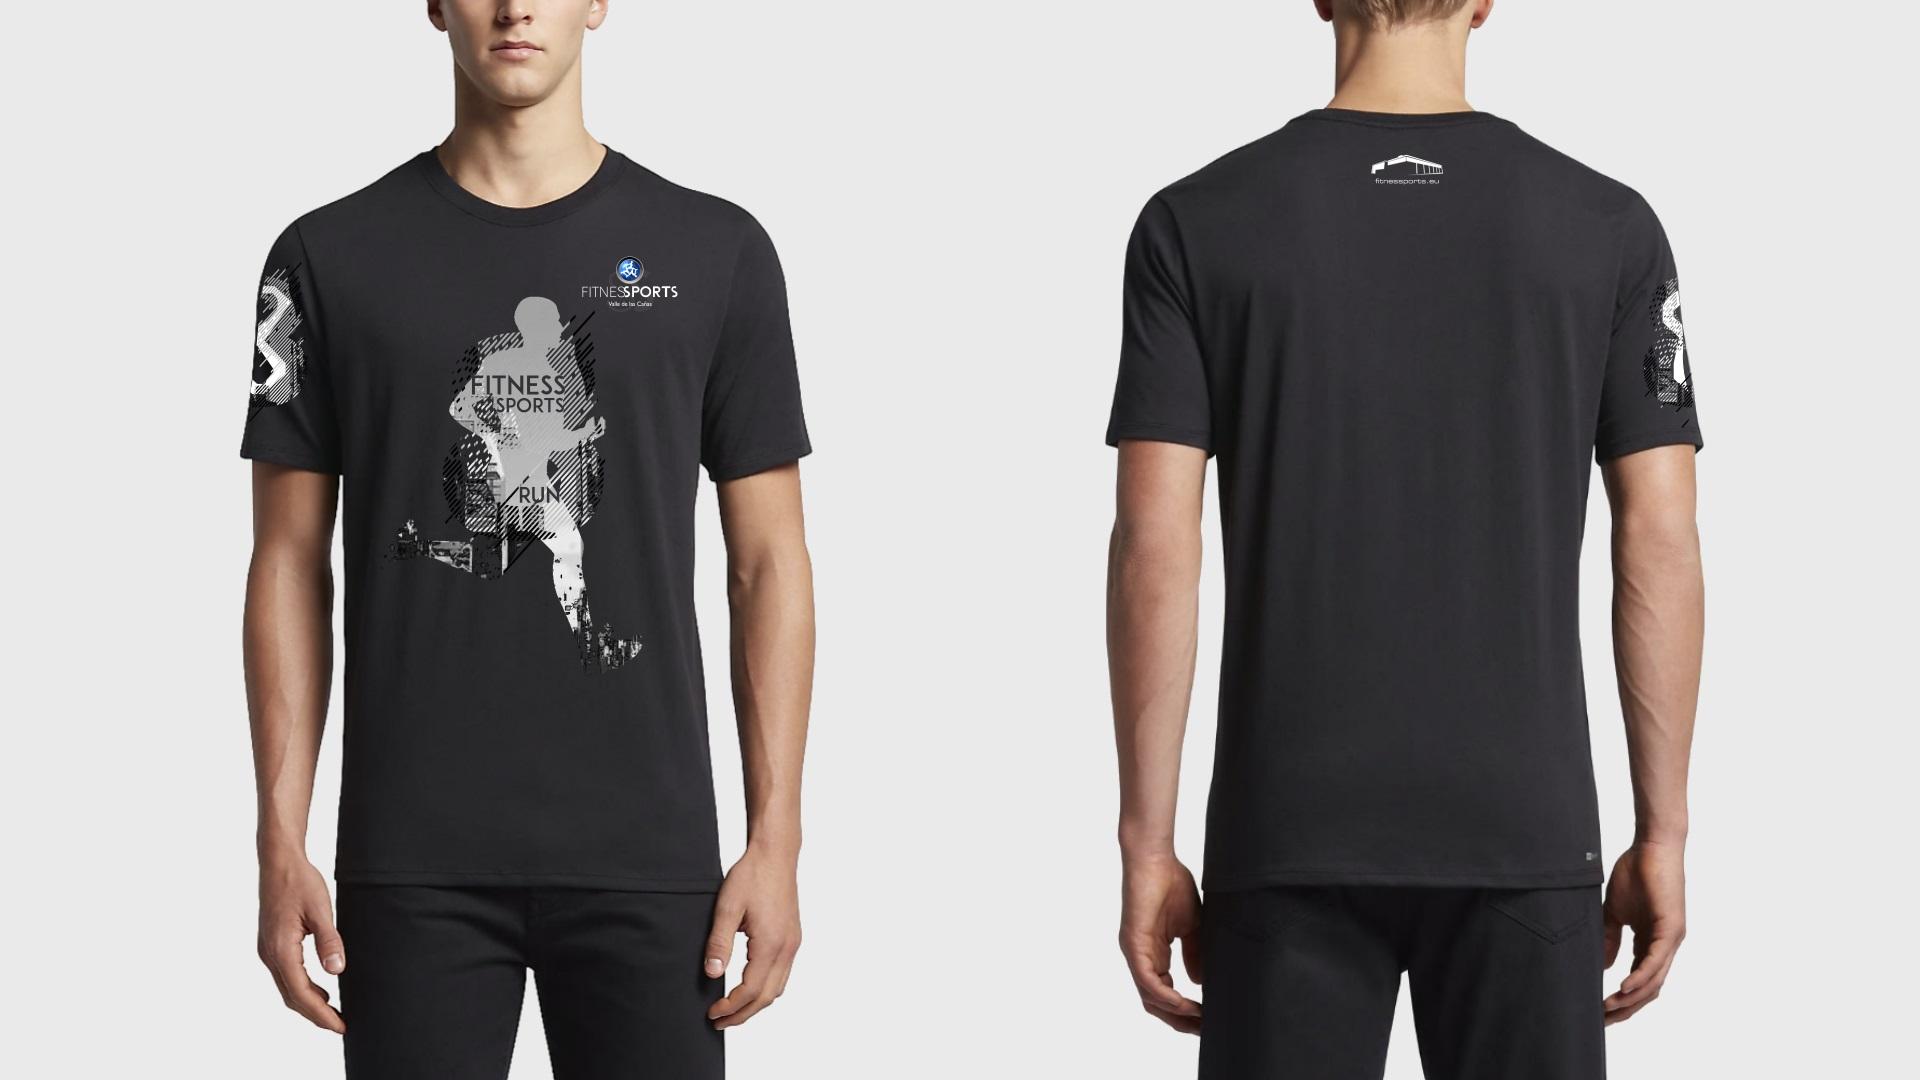 Disñeo de camisetas Fitness SPorts